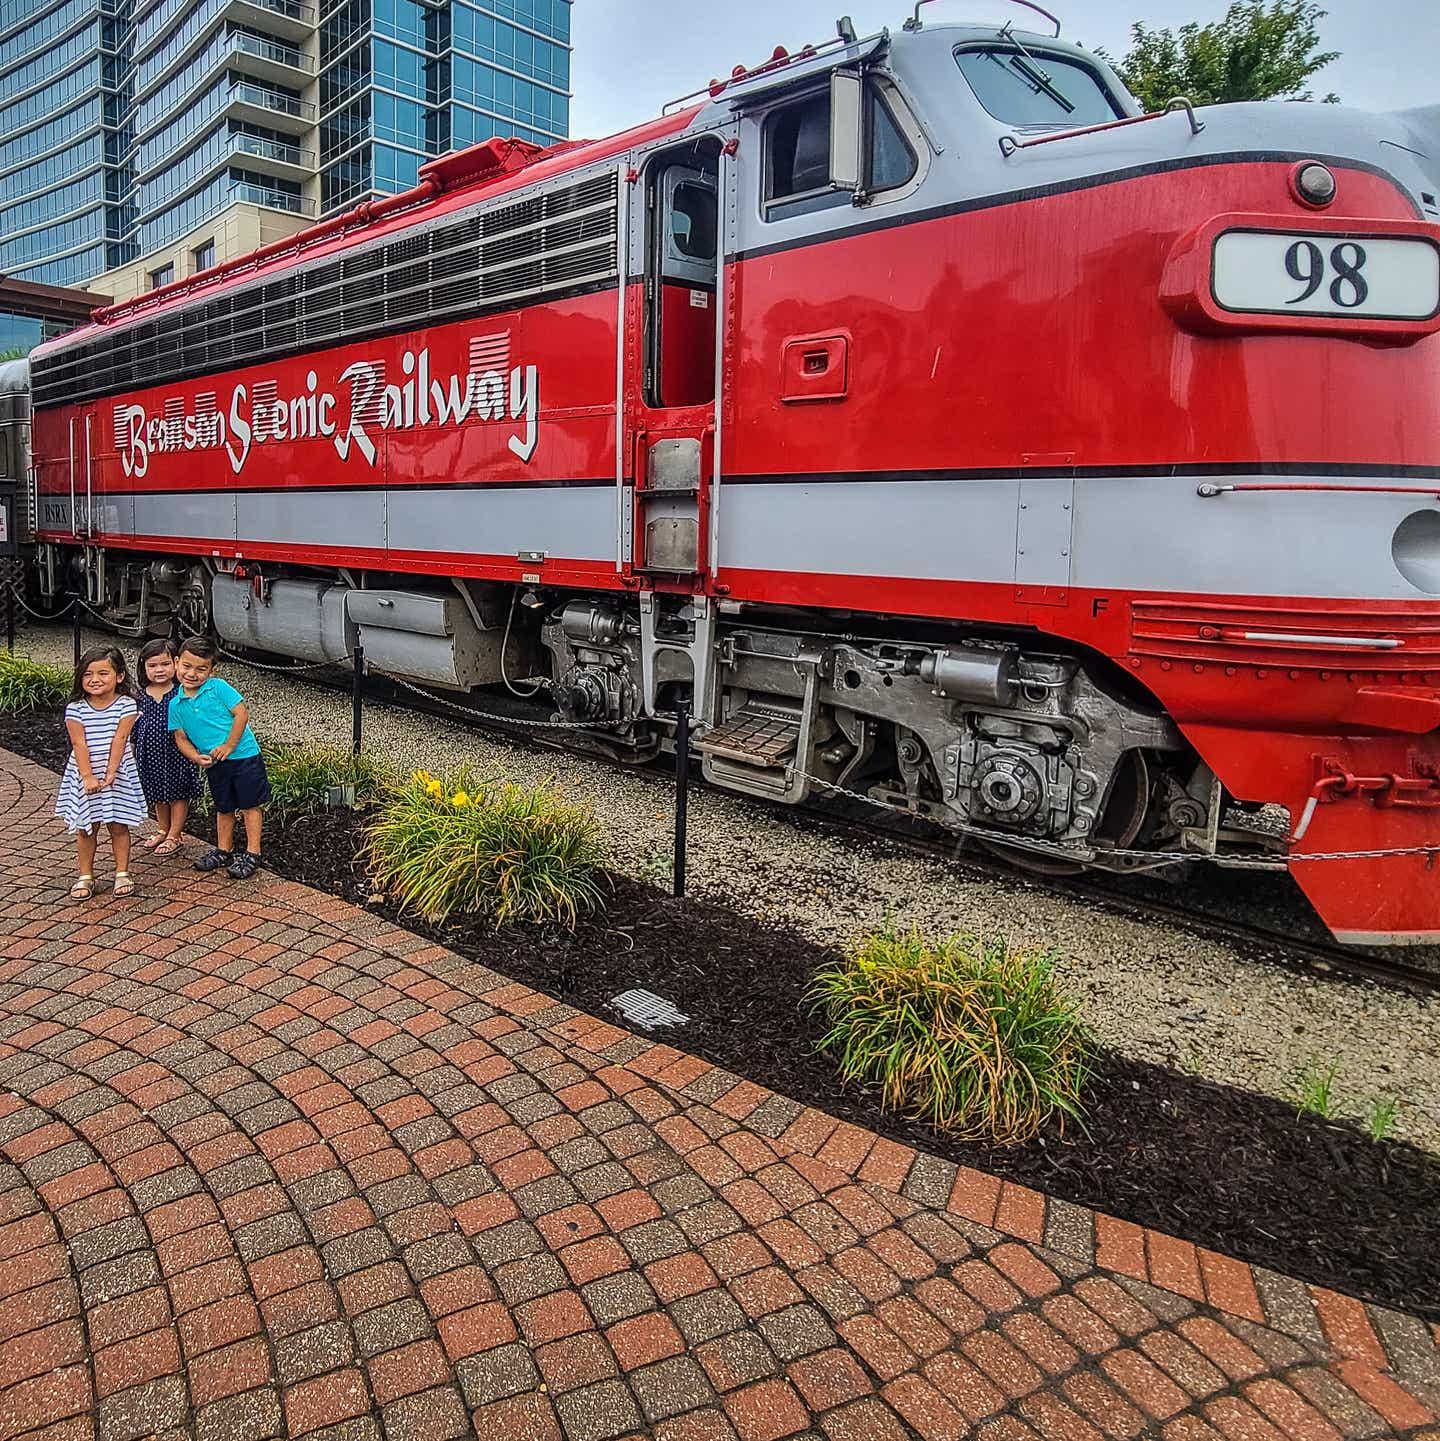 Angelica's kids at the Branson Scenic Railway